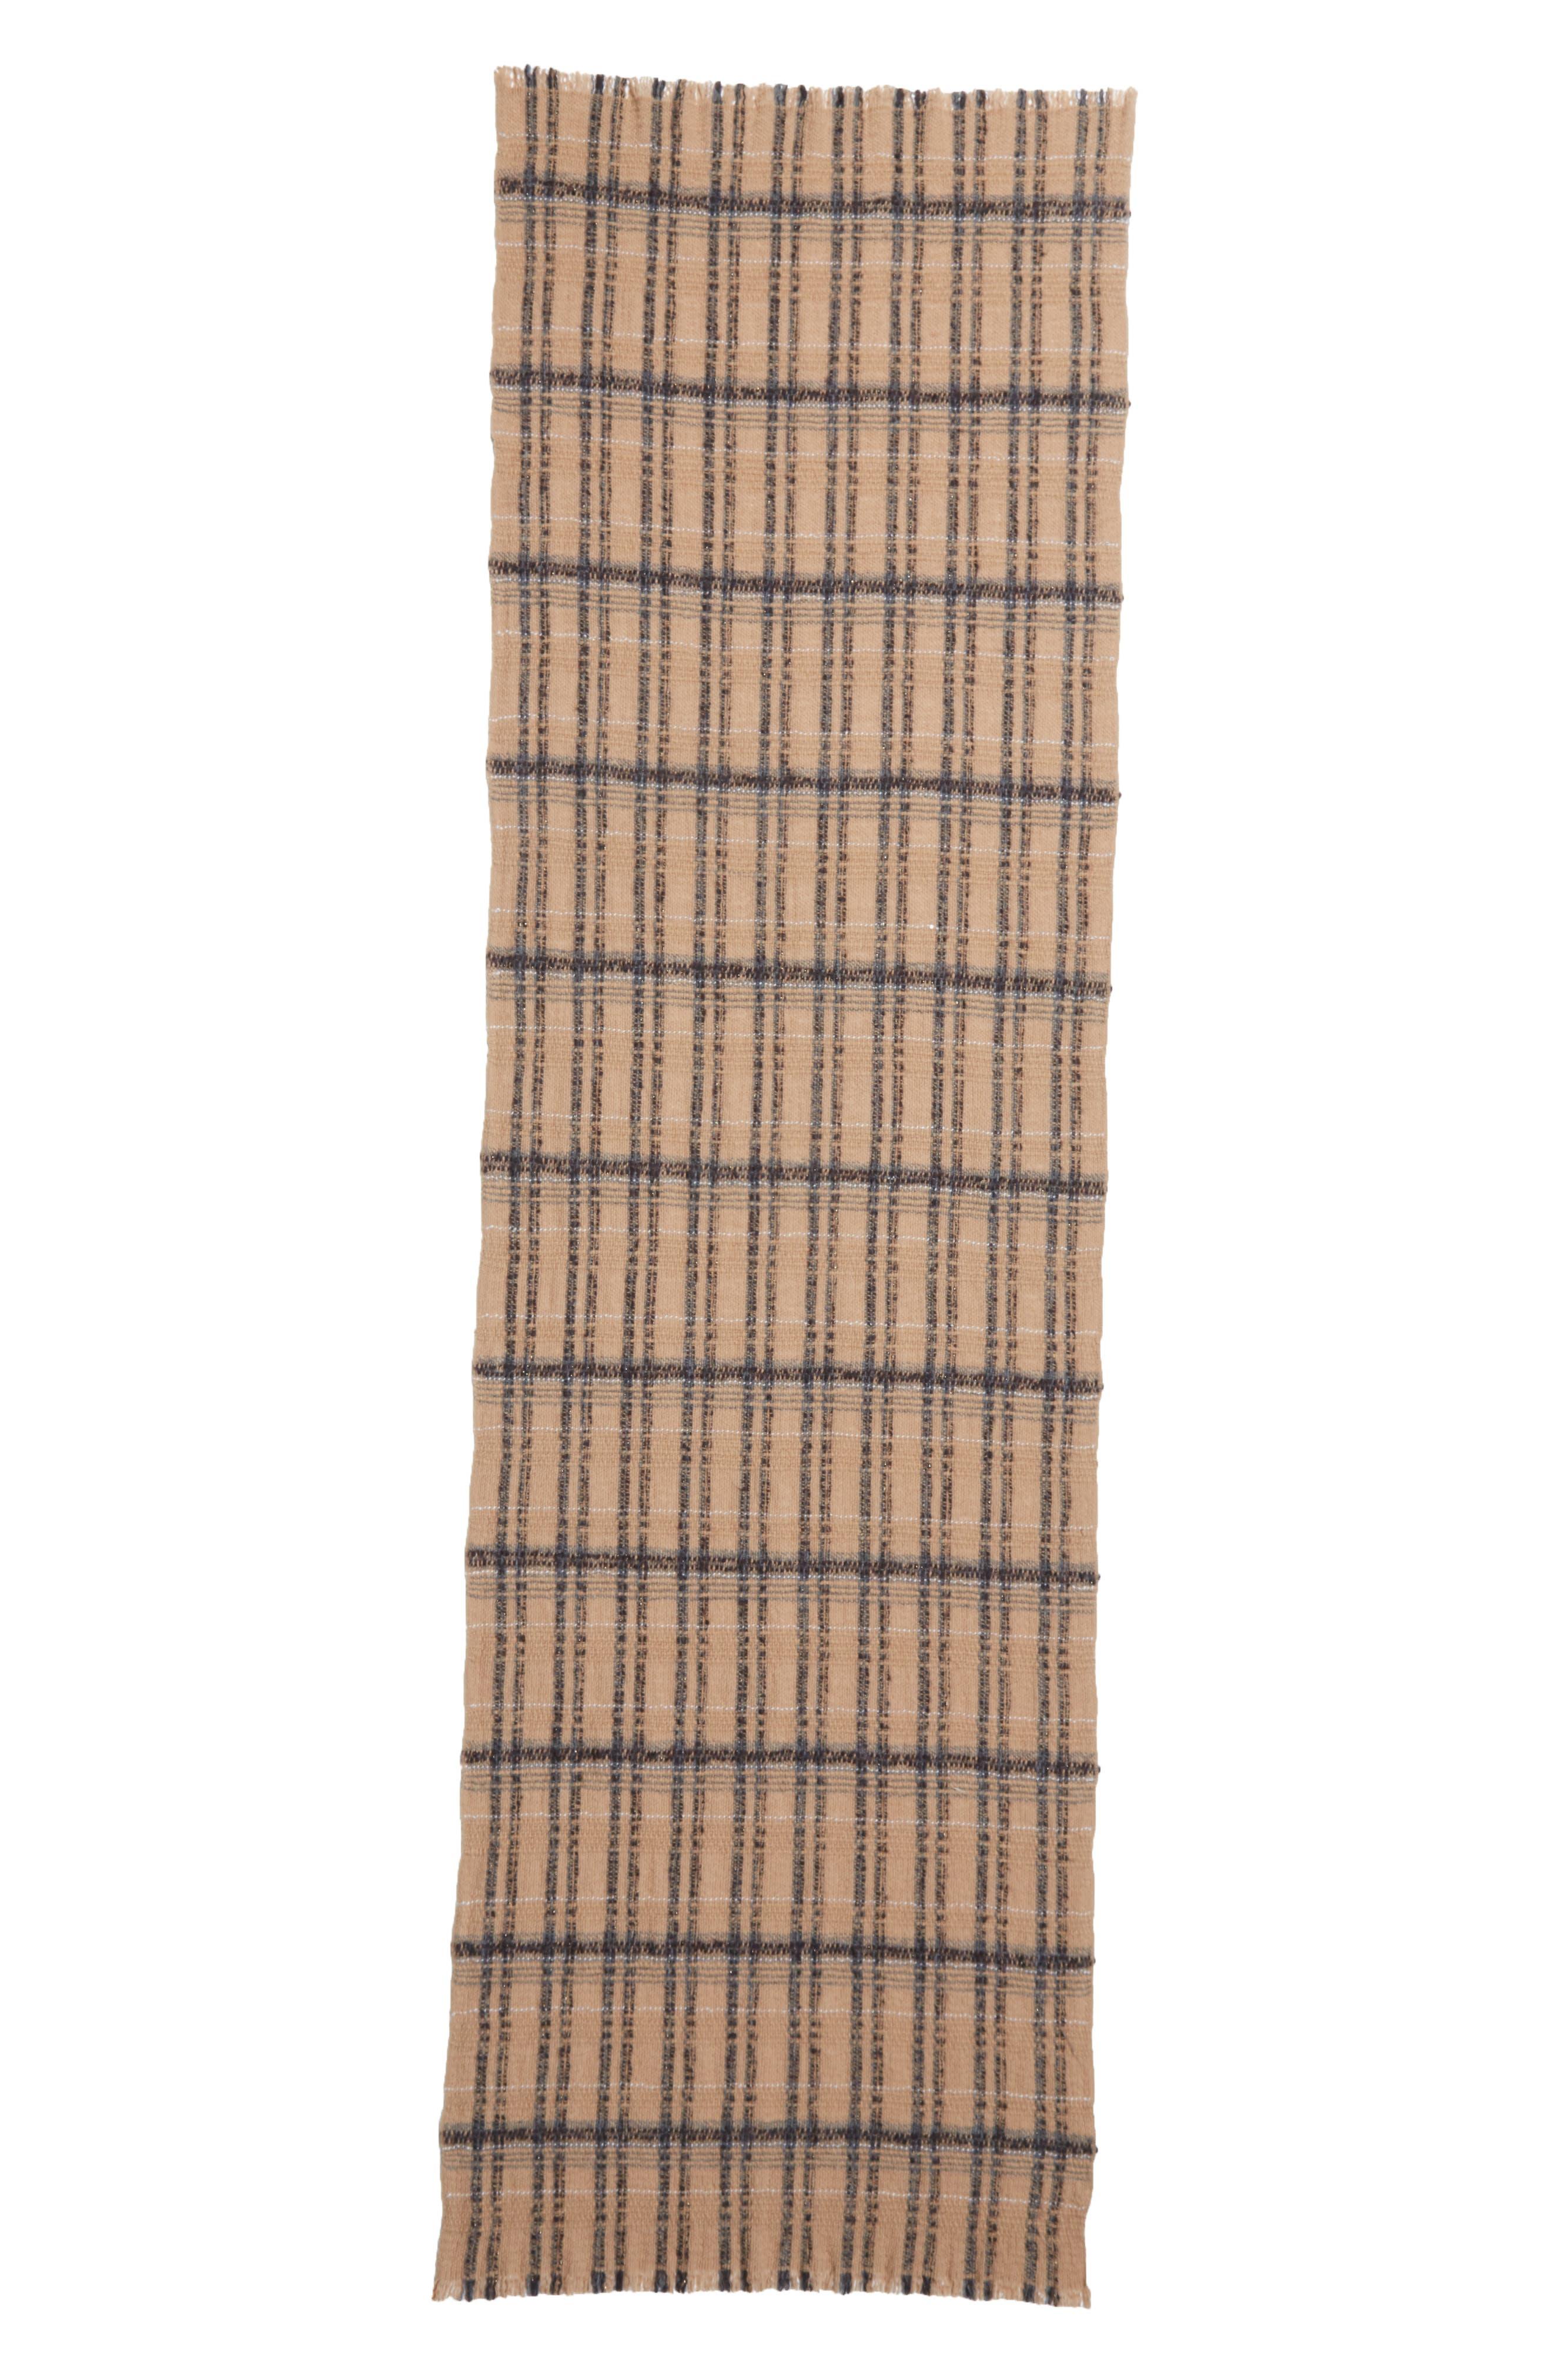 FABIANA FILIPPI Plaid Cashmere, Alpaca & Wool Scarf